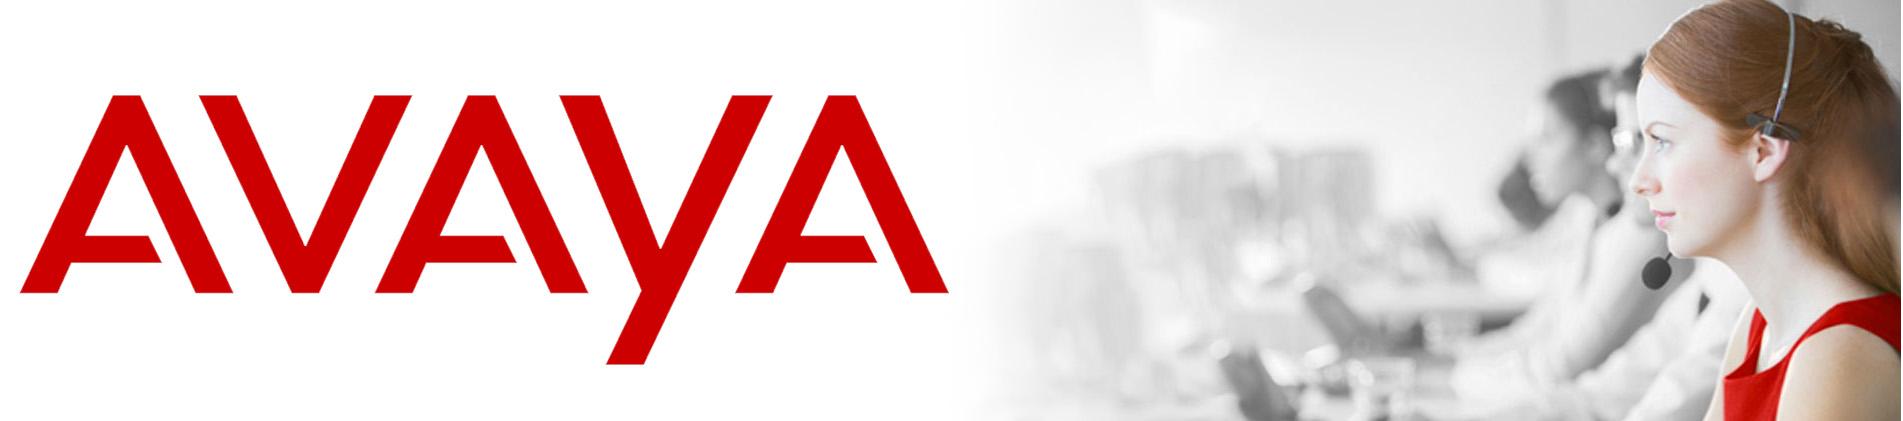 Avaya Banner